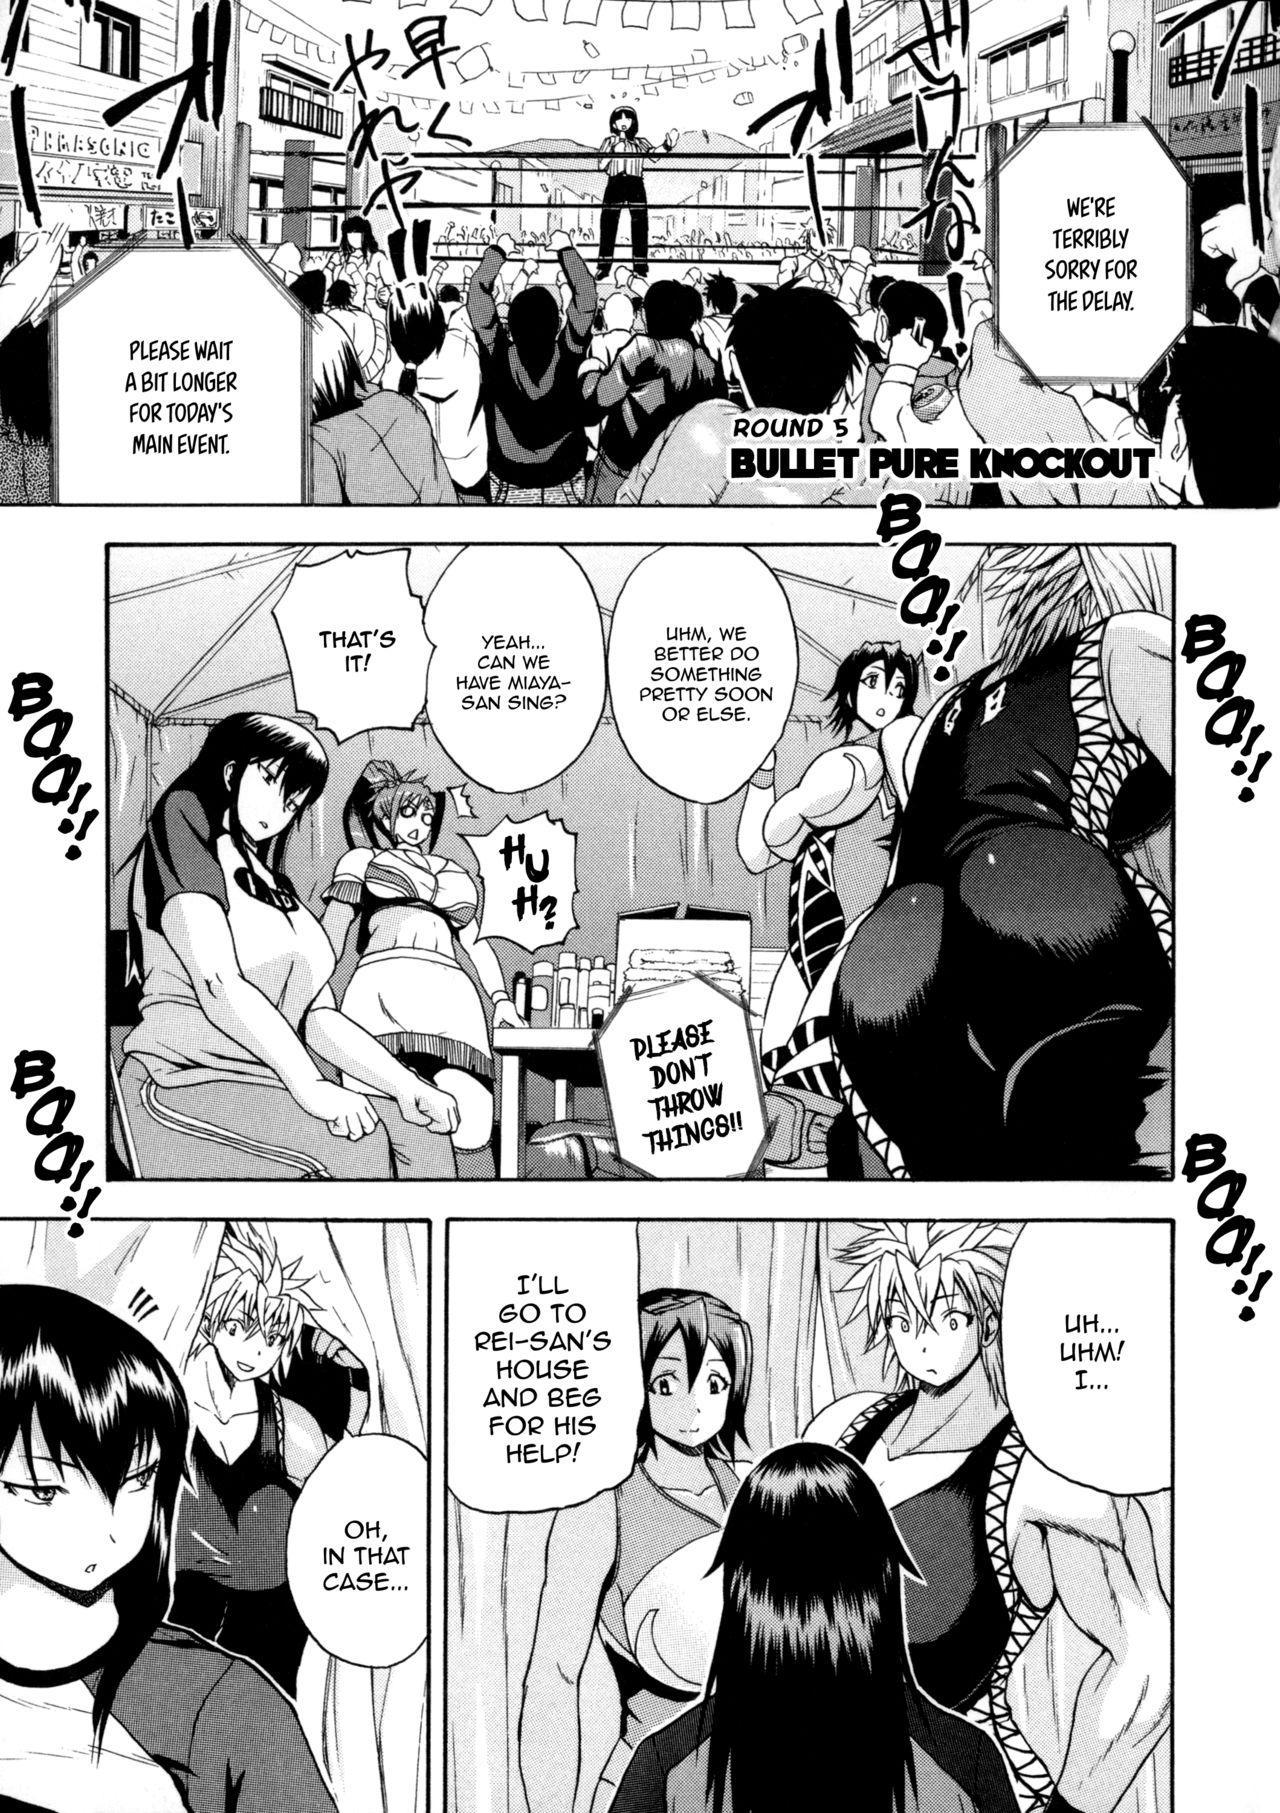 [Yoshimura Tatsumaki] Monzetsu Taigatame ~Count 3 de Ikasete Ageru~ | Faint in Agony Bodylock ~I'll make you cum on the count of 3~ [English] [Brolen] 149